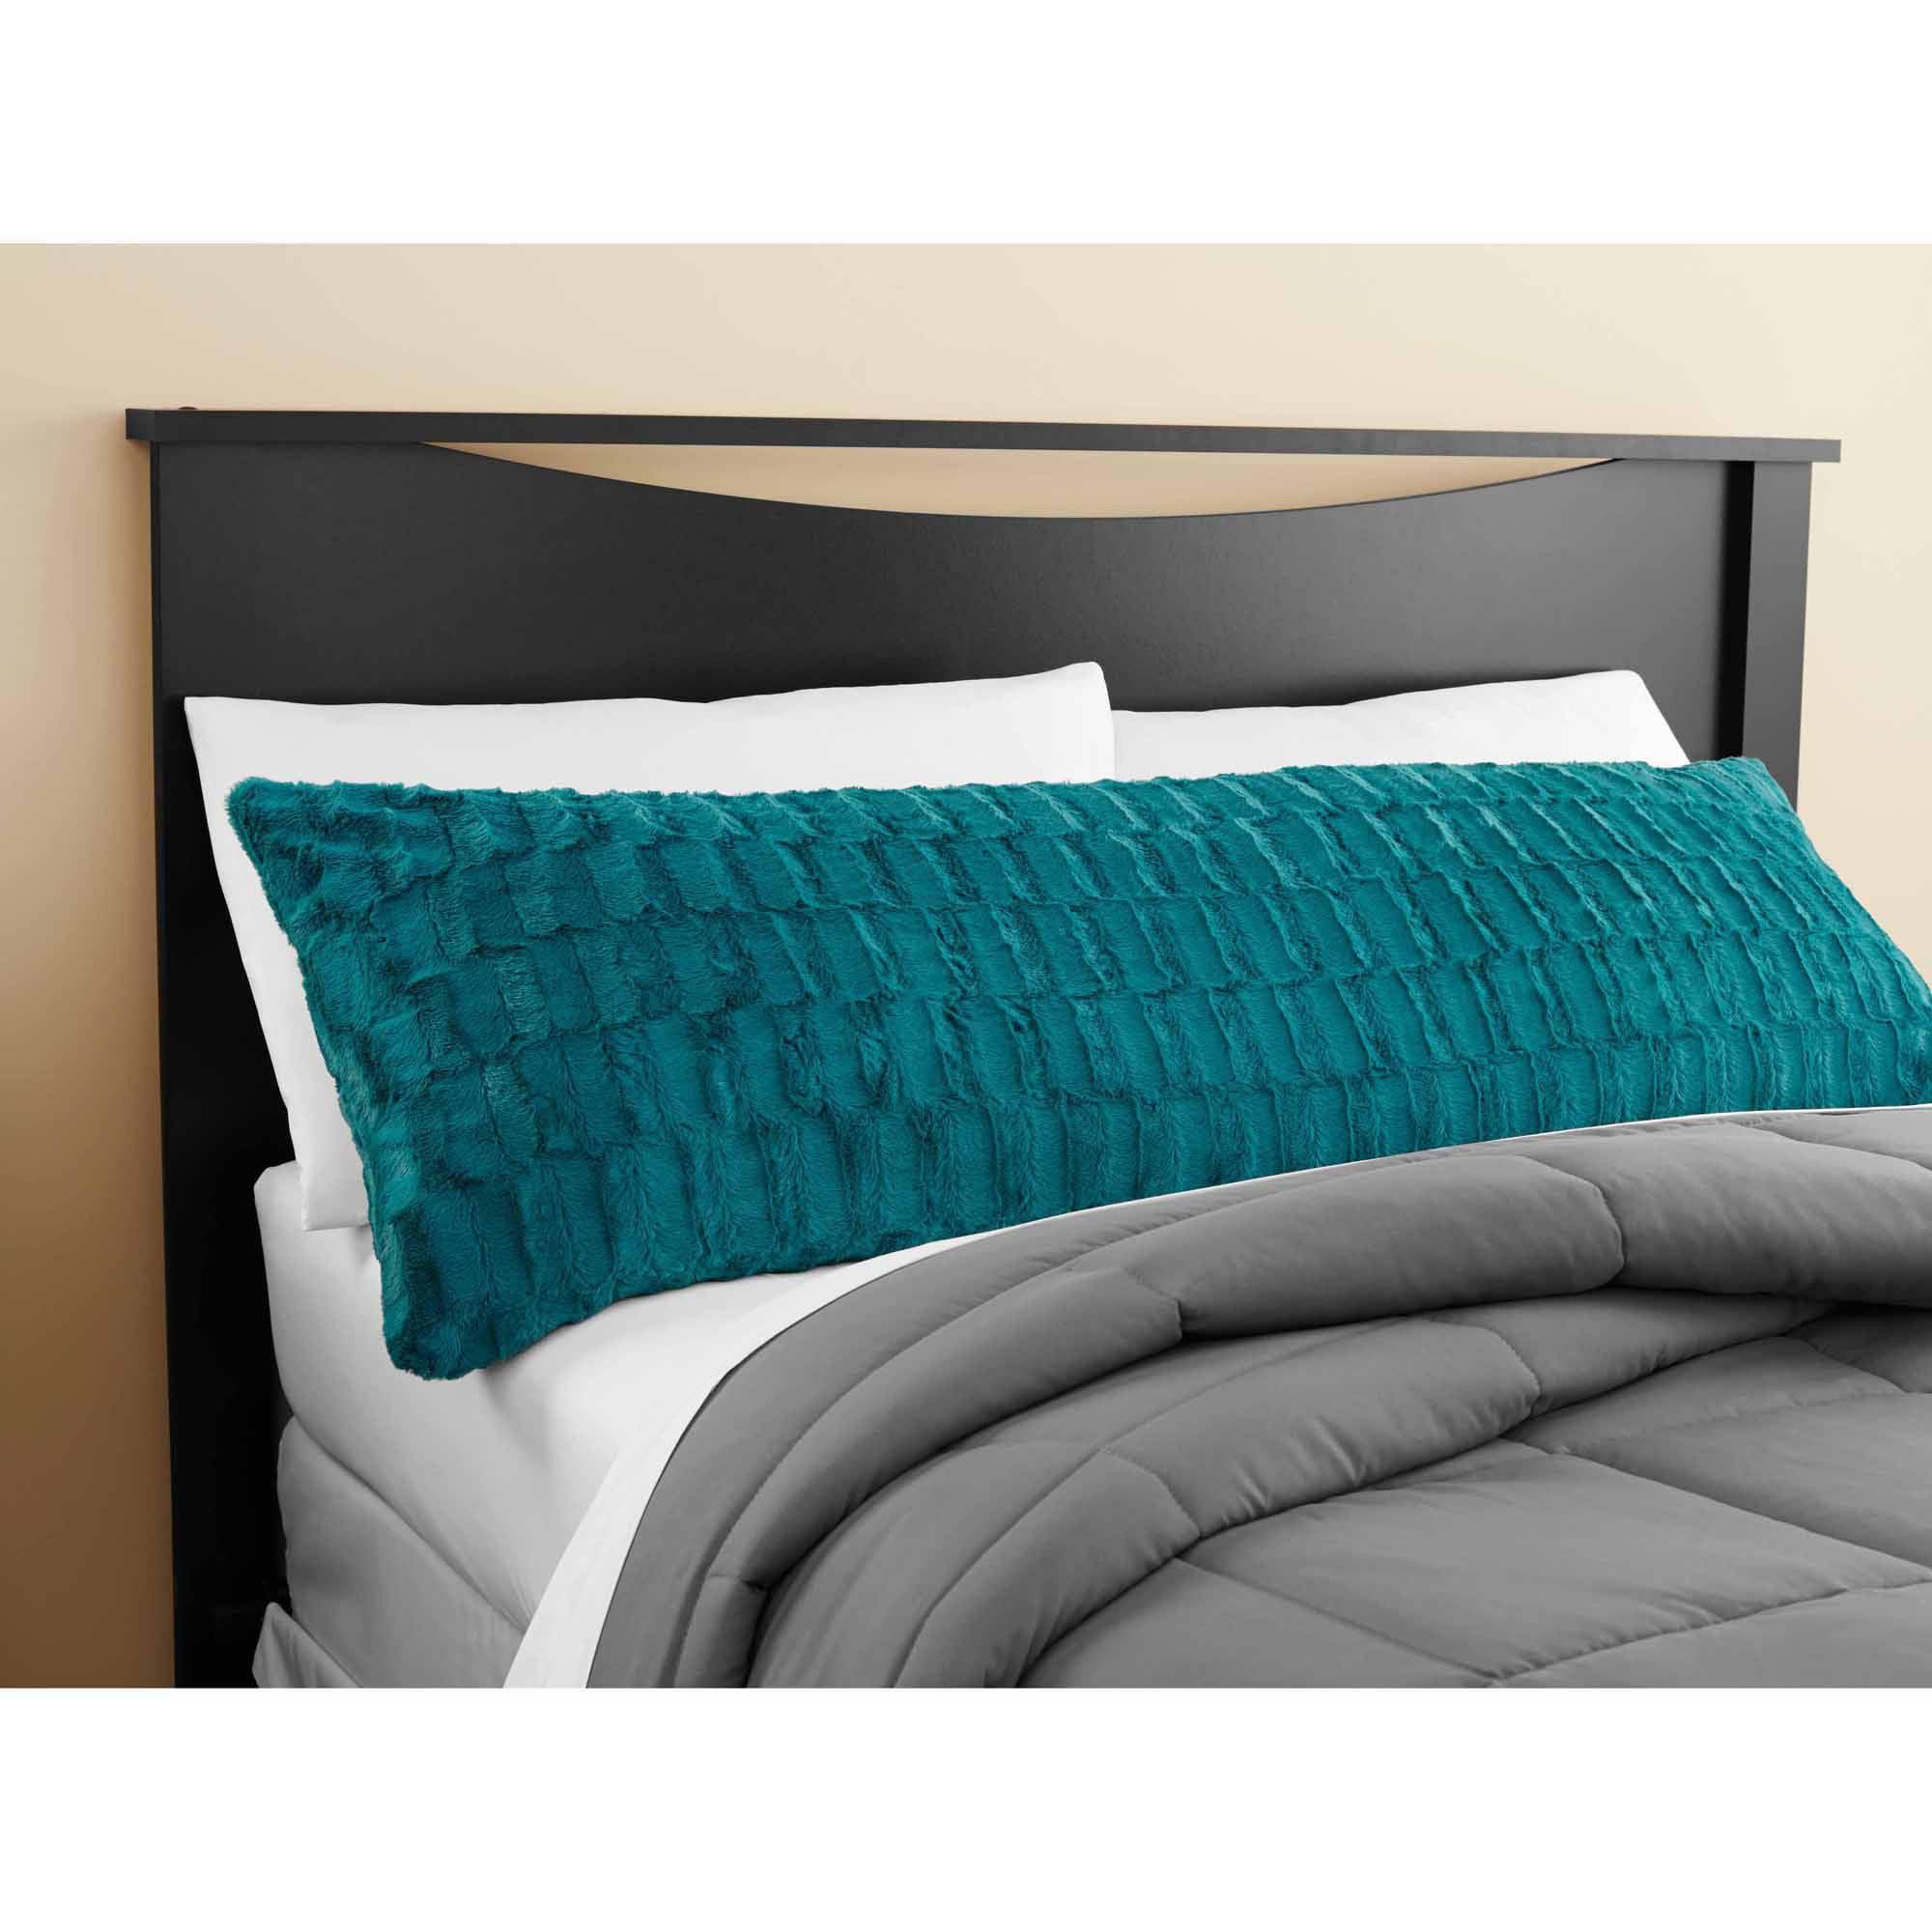 Mainstays Teal Sachet Bamboo Fur Body Pillow Cover